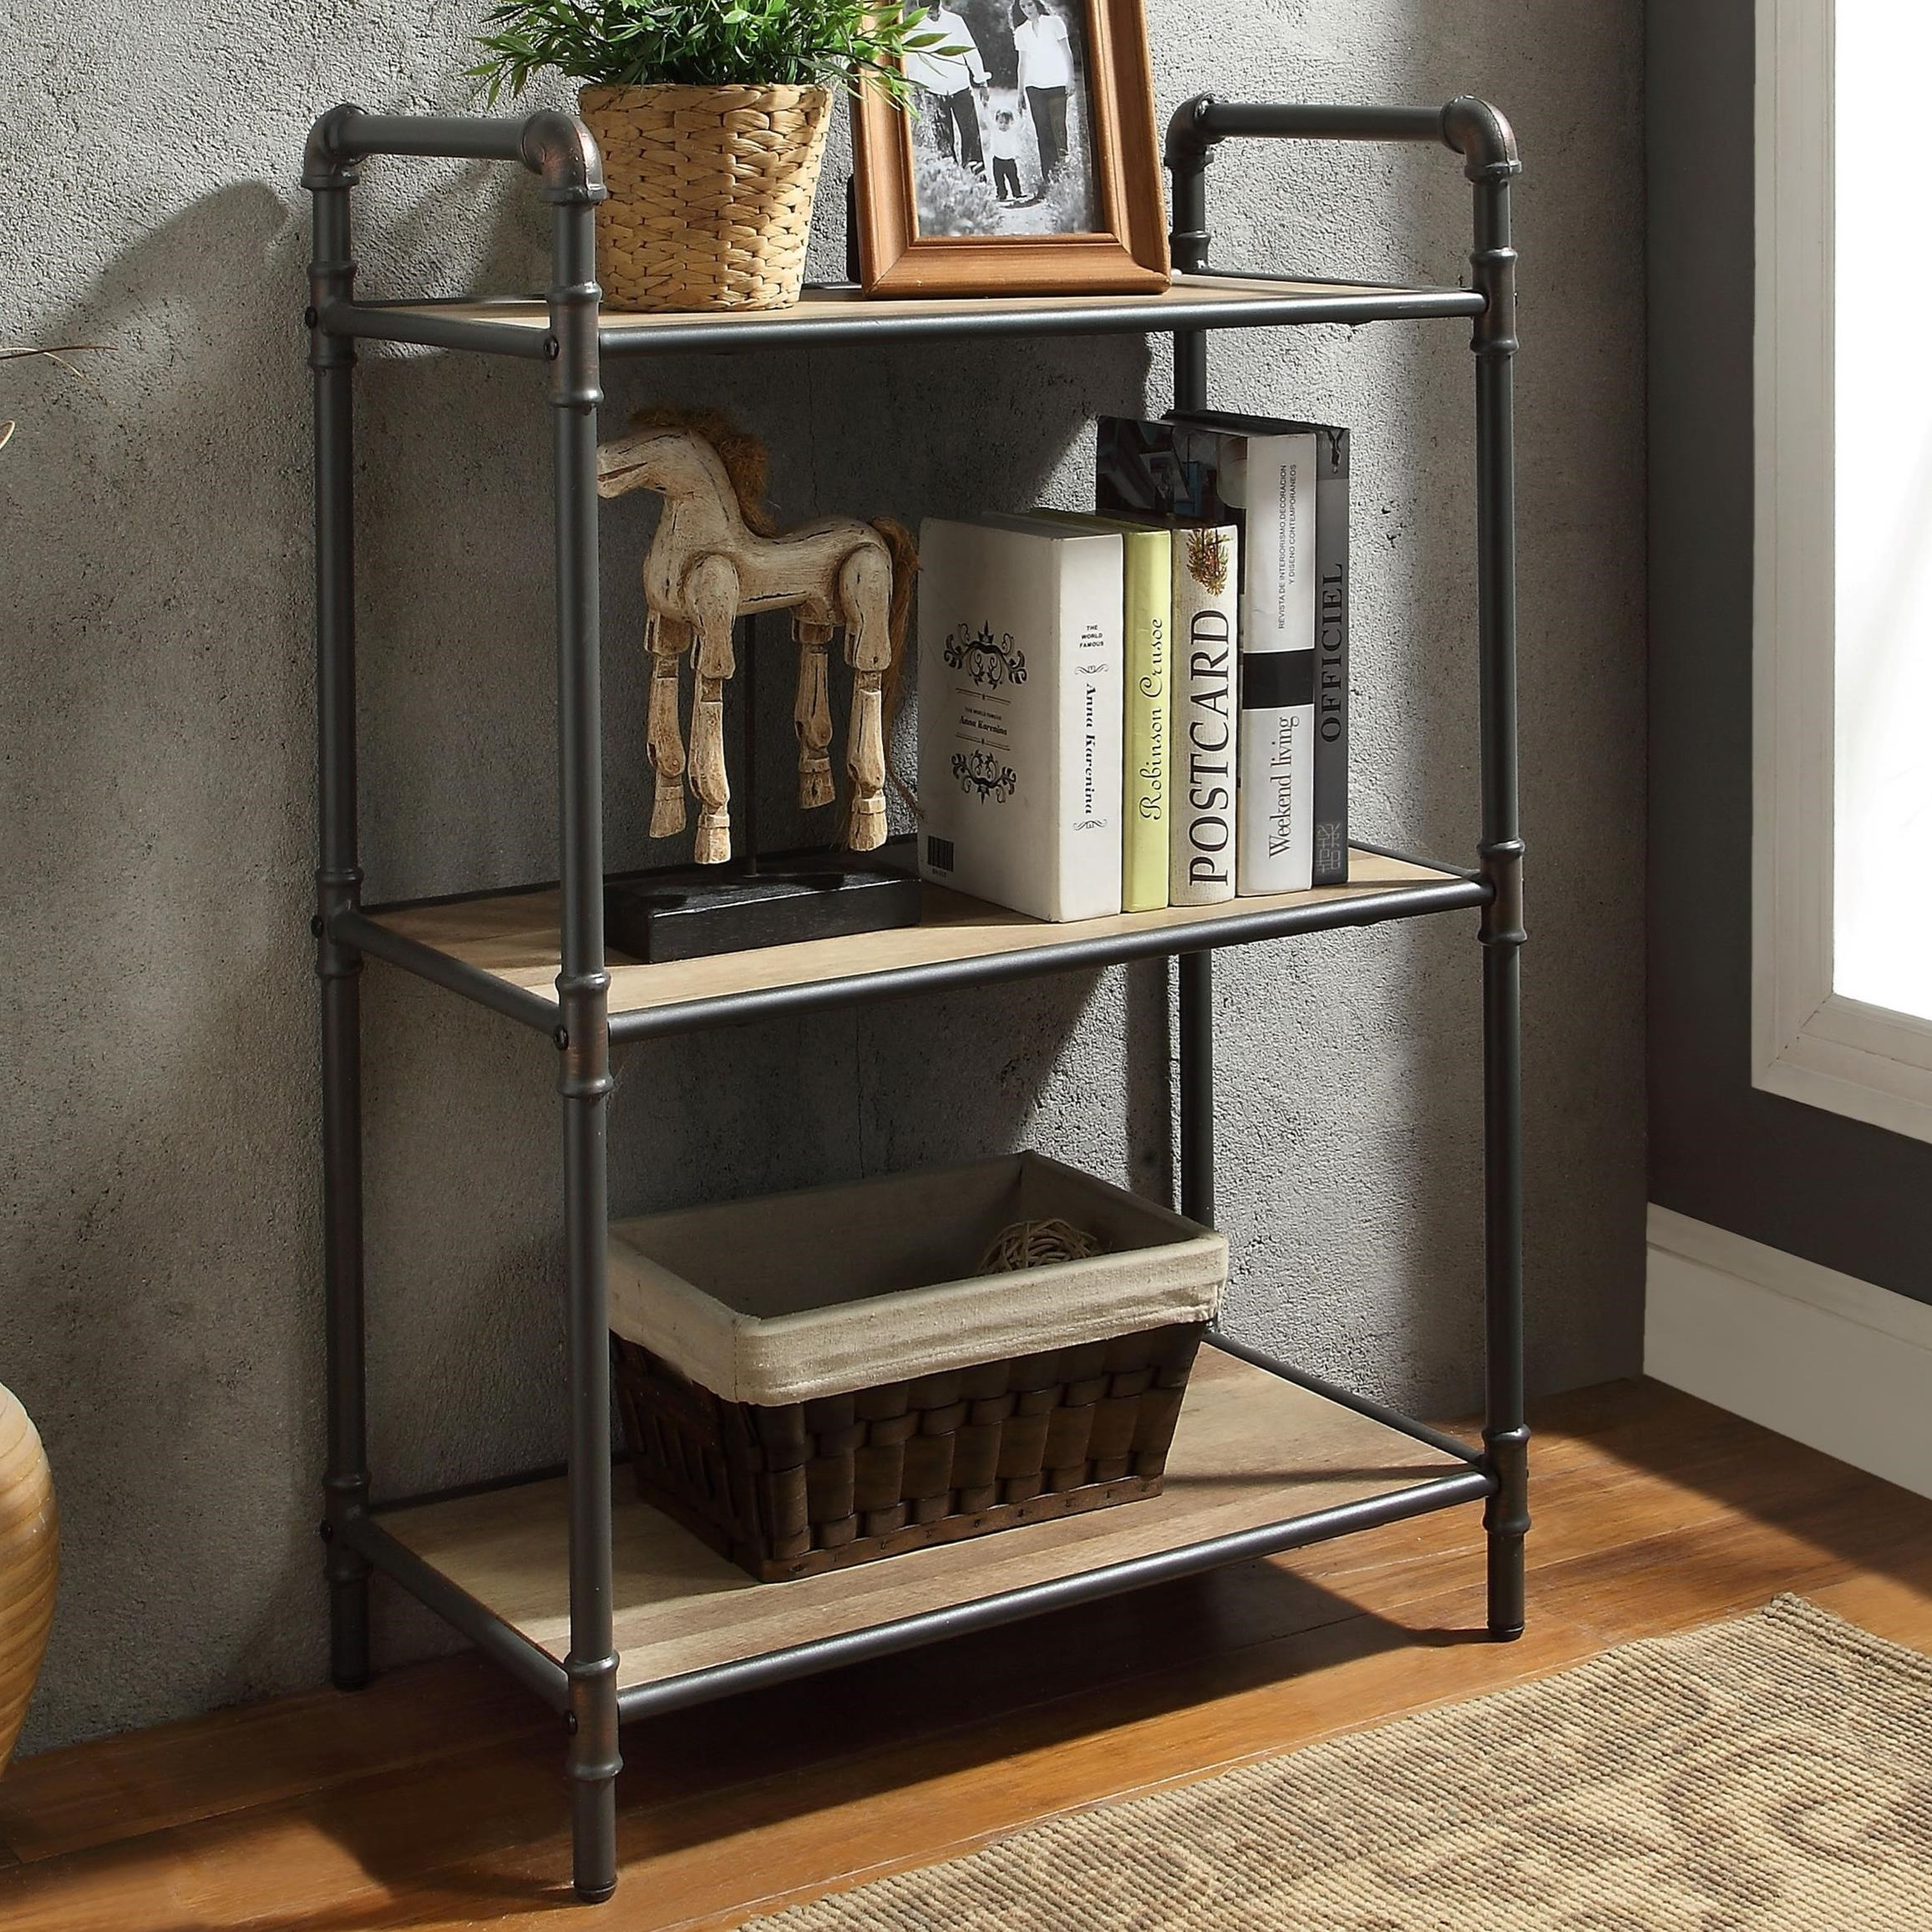 Itzel Bookshelf by Acme Furniture at Carolina Direct